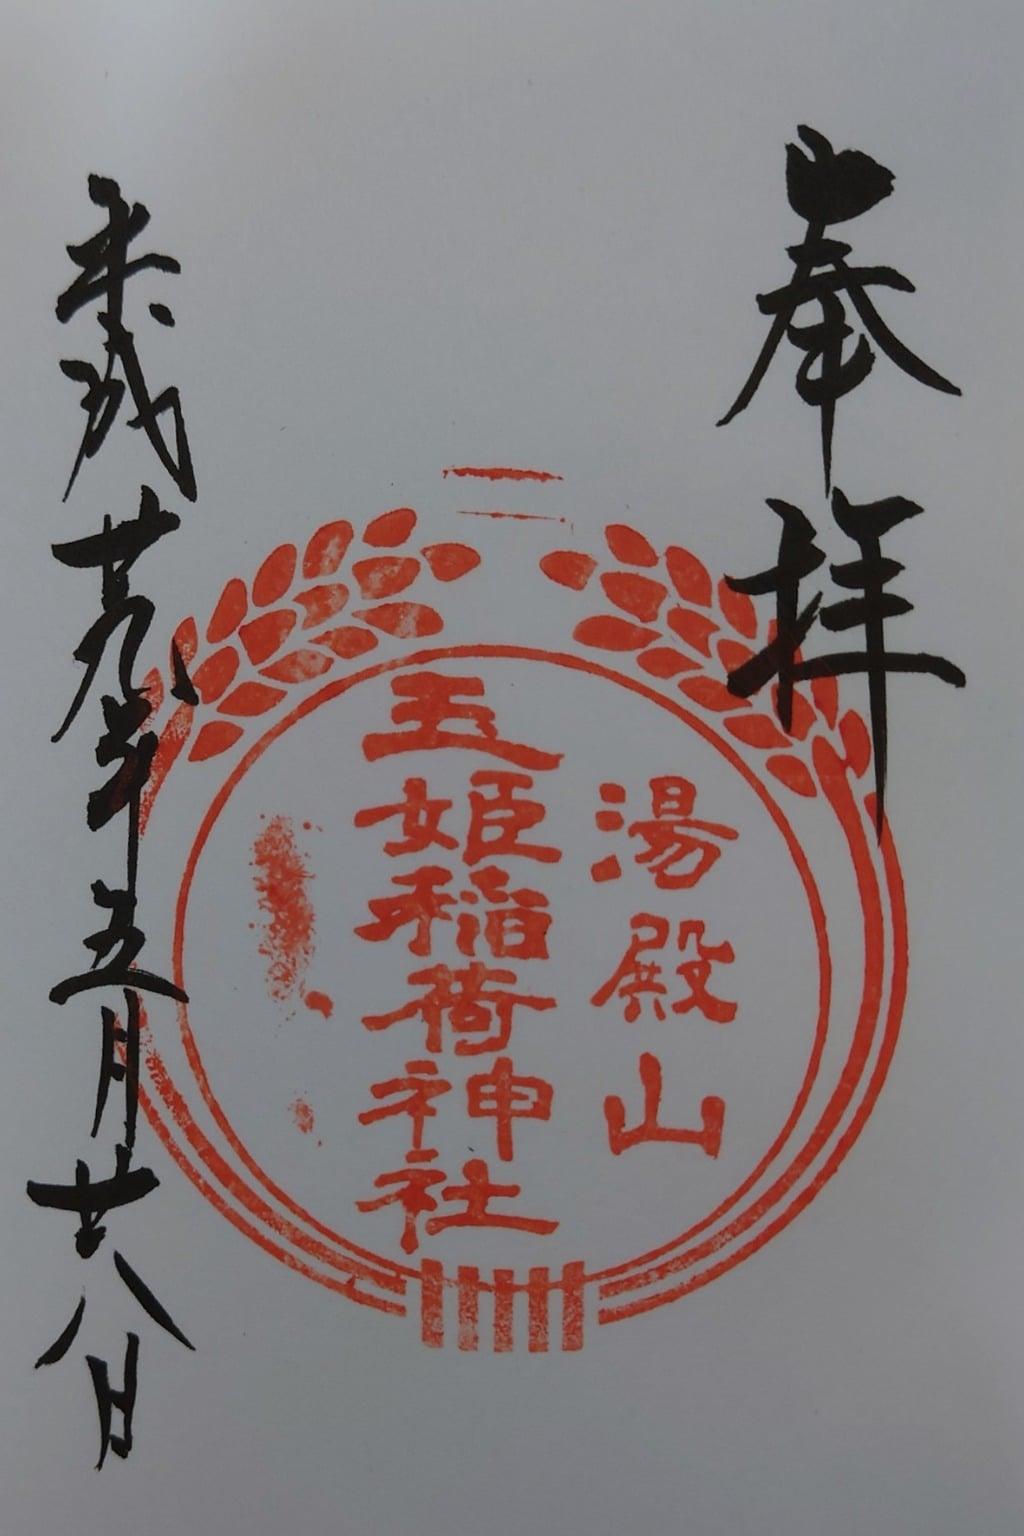 湯殿山玉姫稲荷神社の御朱印